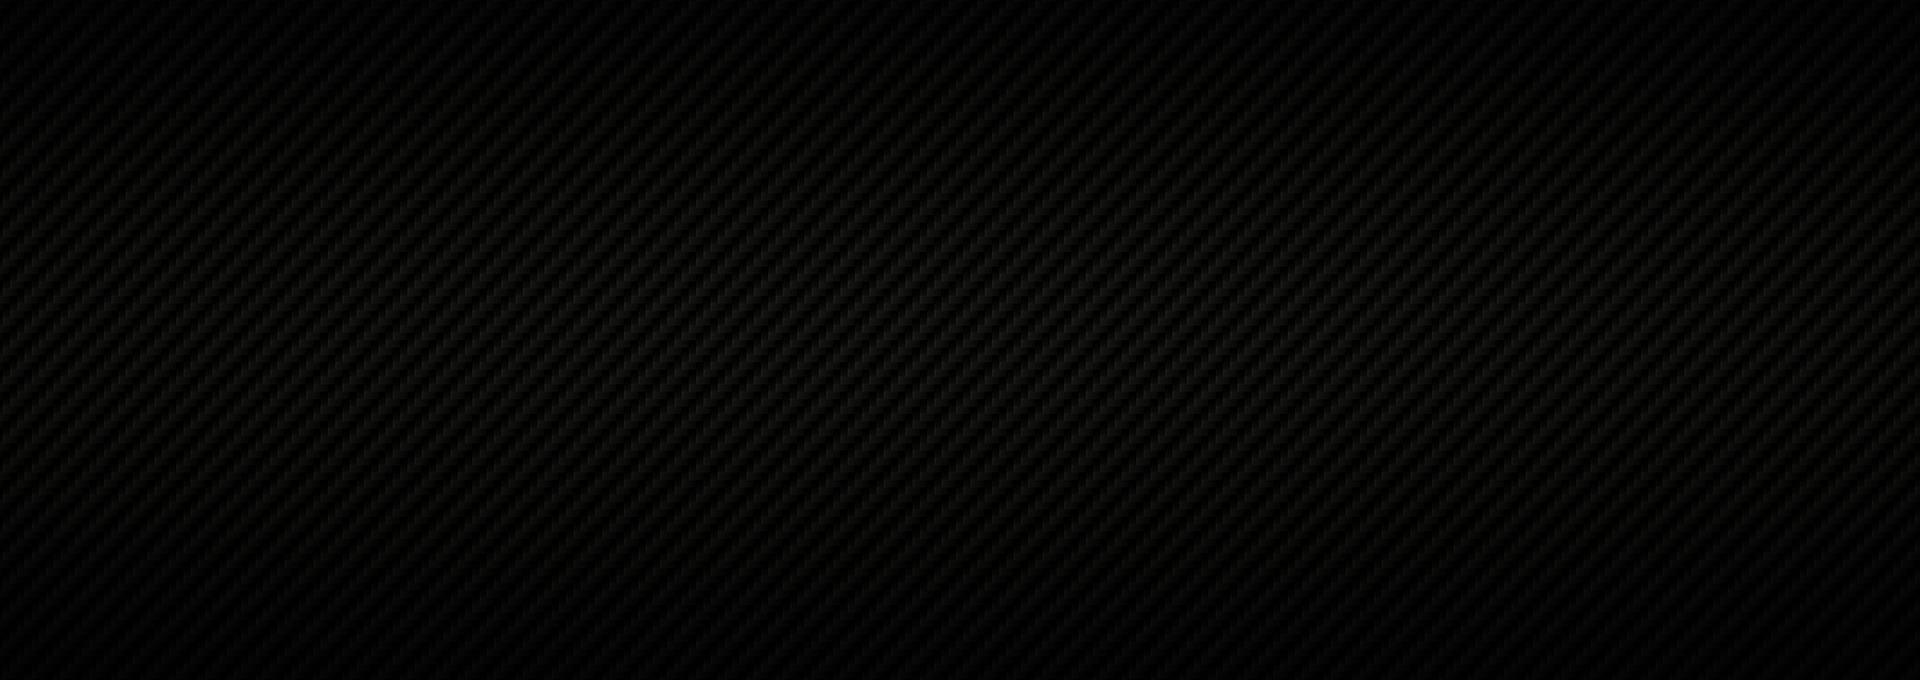 BKS Boya Kaplama | Teflon Kaplama Zemin